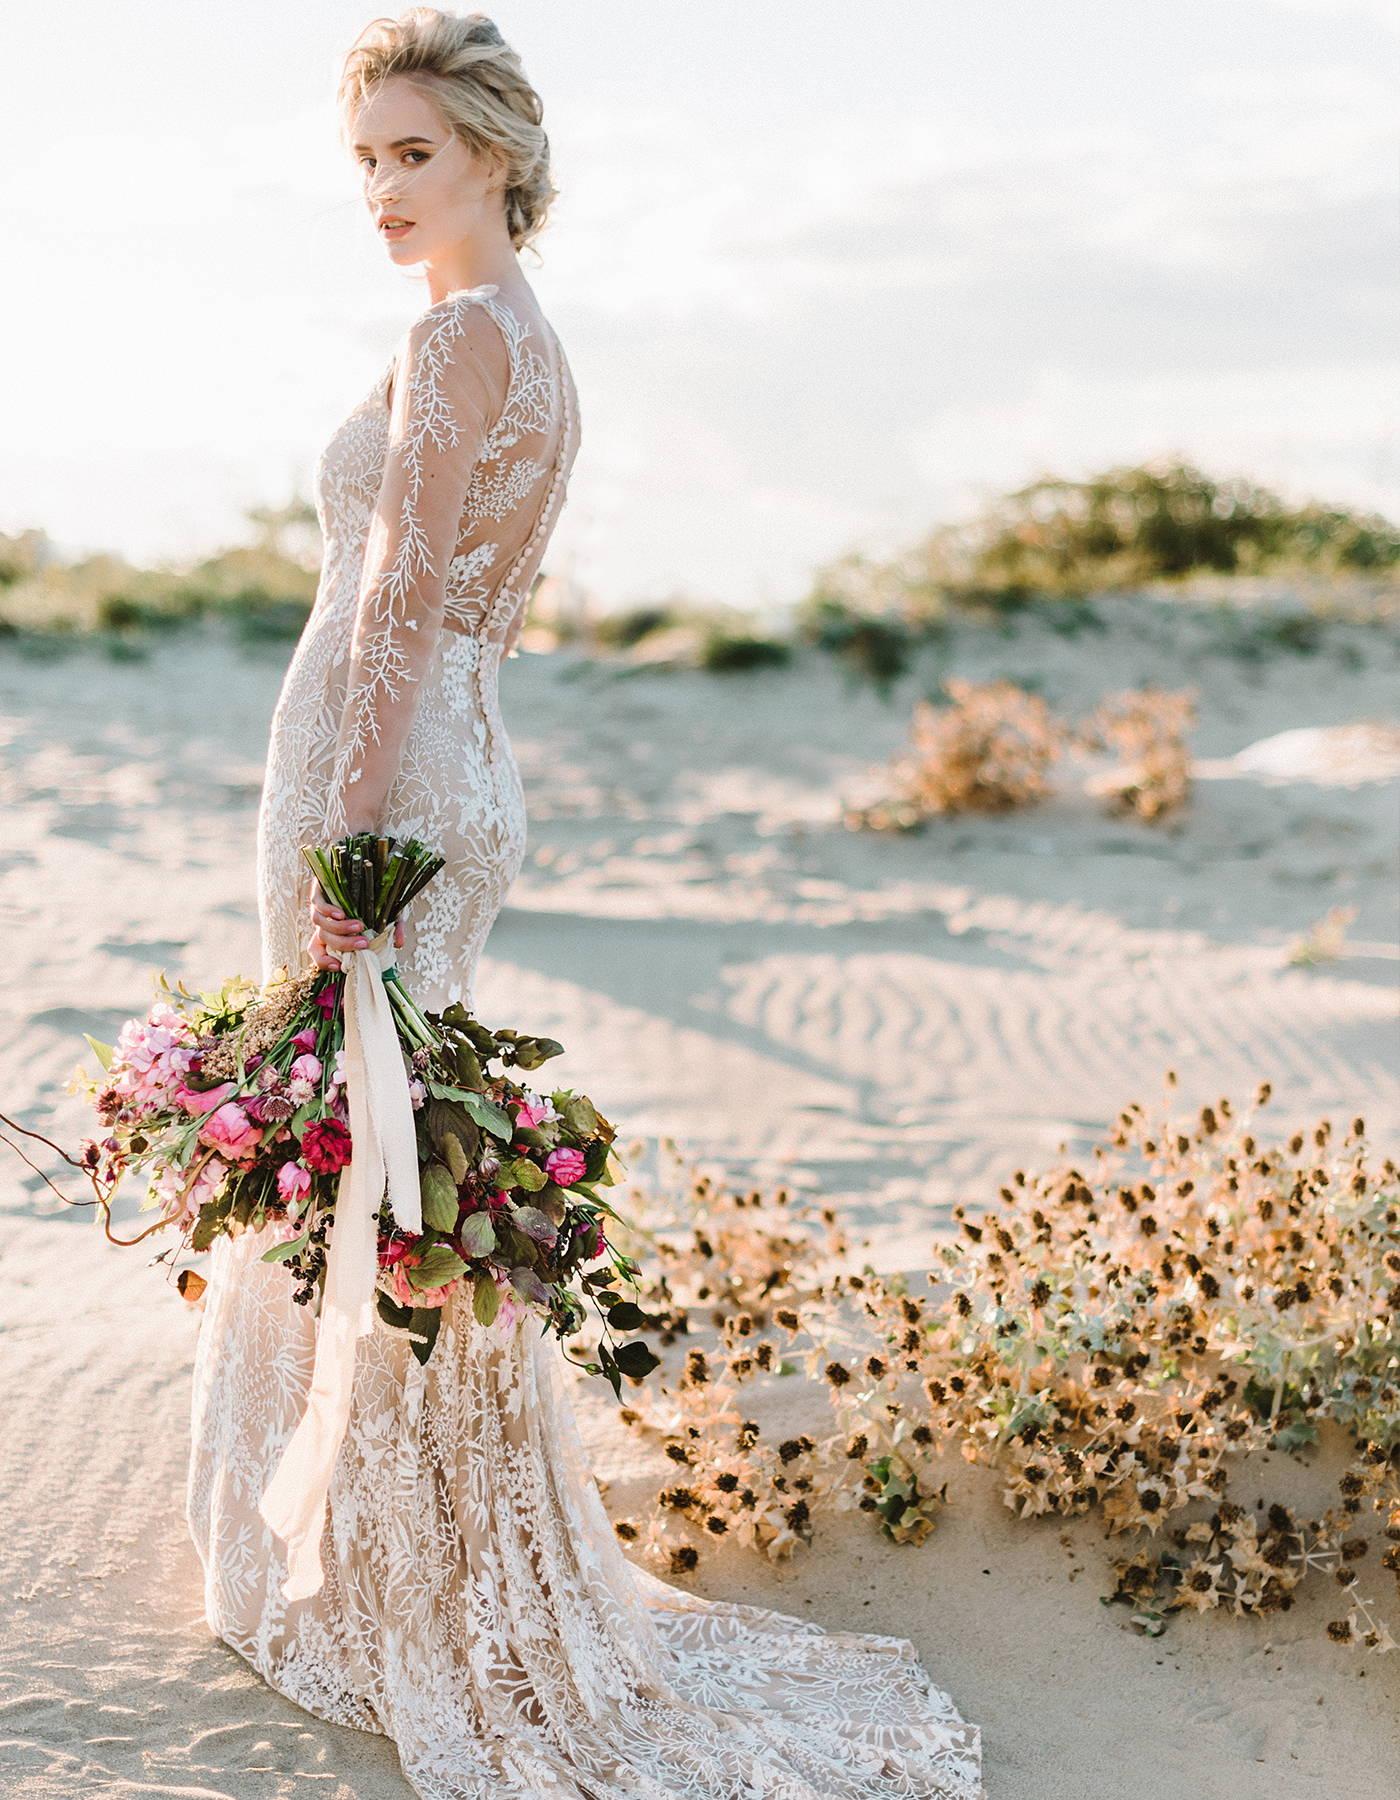 This low back lace mermaid wedding dress has a unique vine floral lace. It is a nude lace wedding dress.